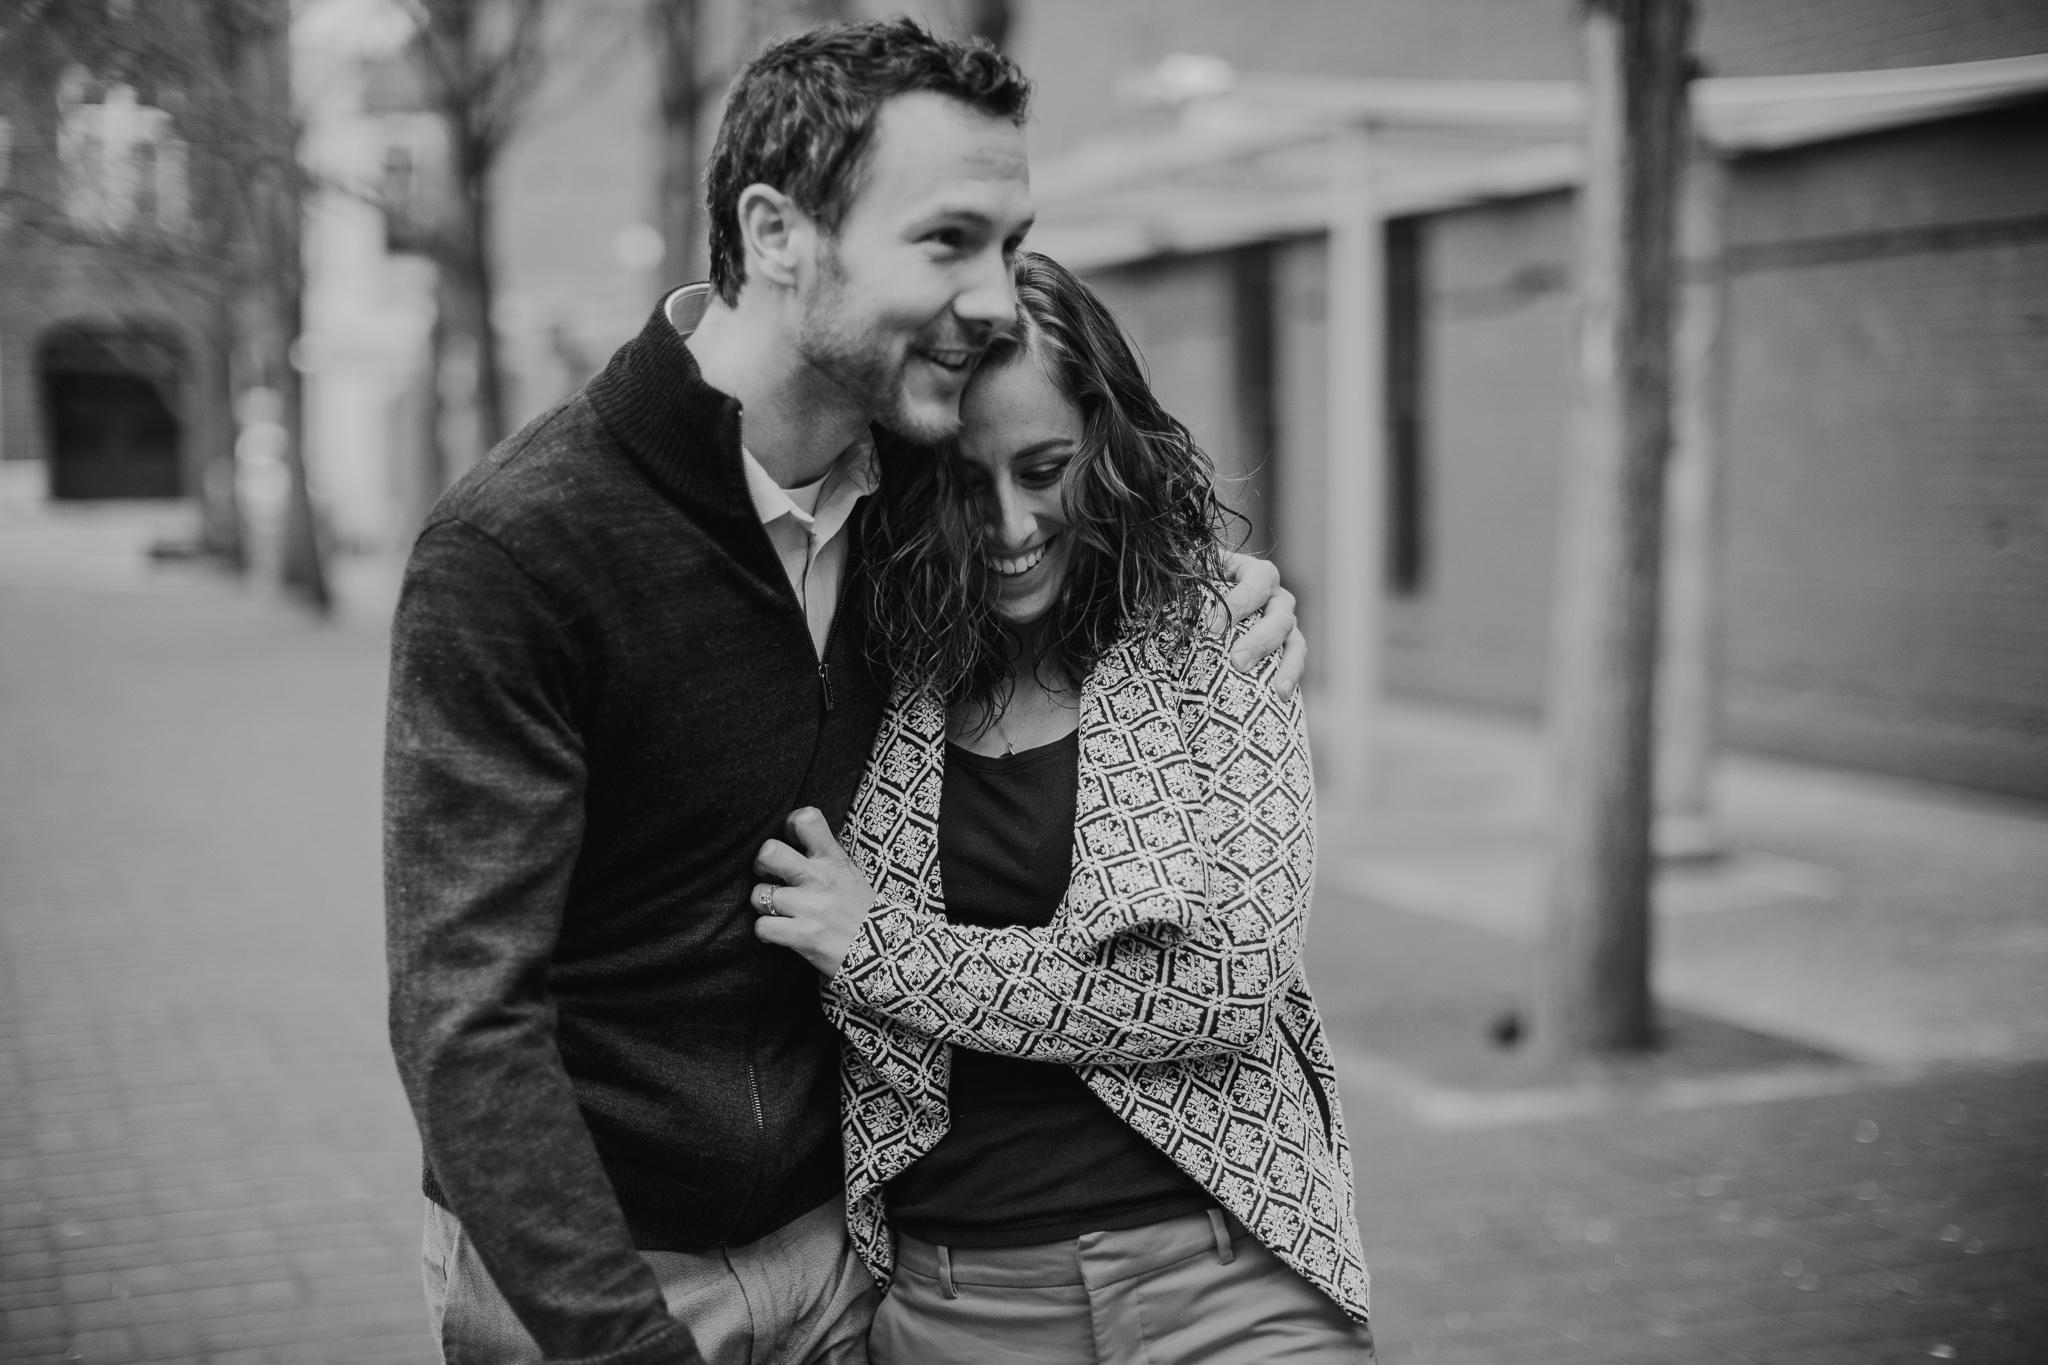 Engagement - Downtown Roanoke - Virginia - Wedding Photographer - Pat Cori Photography-39.jpg